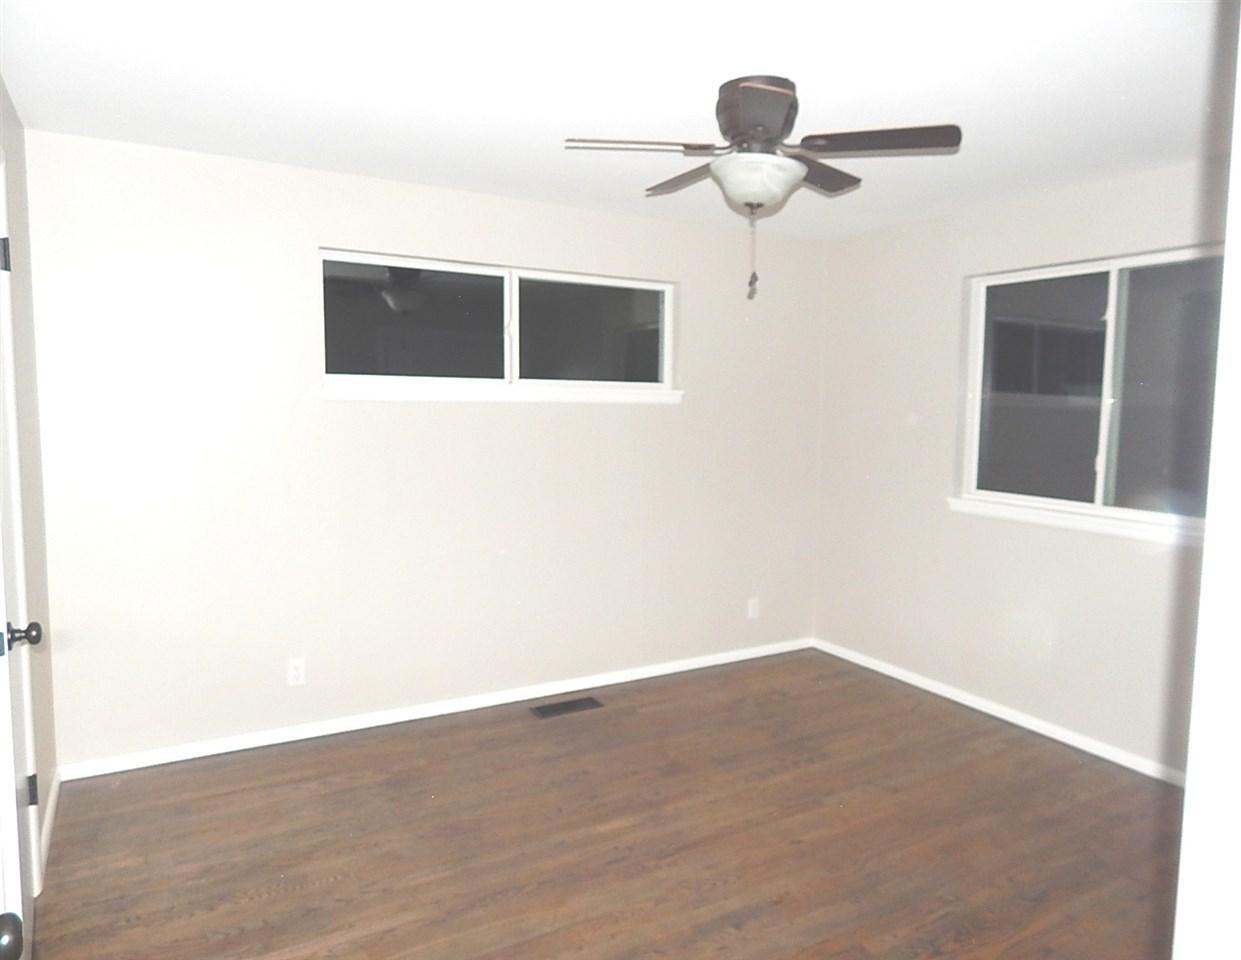 Sold Cross Sale W/ MLS | 1604 Blackard Ponca City, OK 74604 12